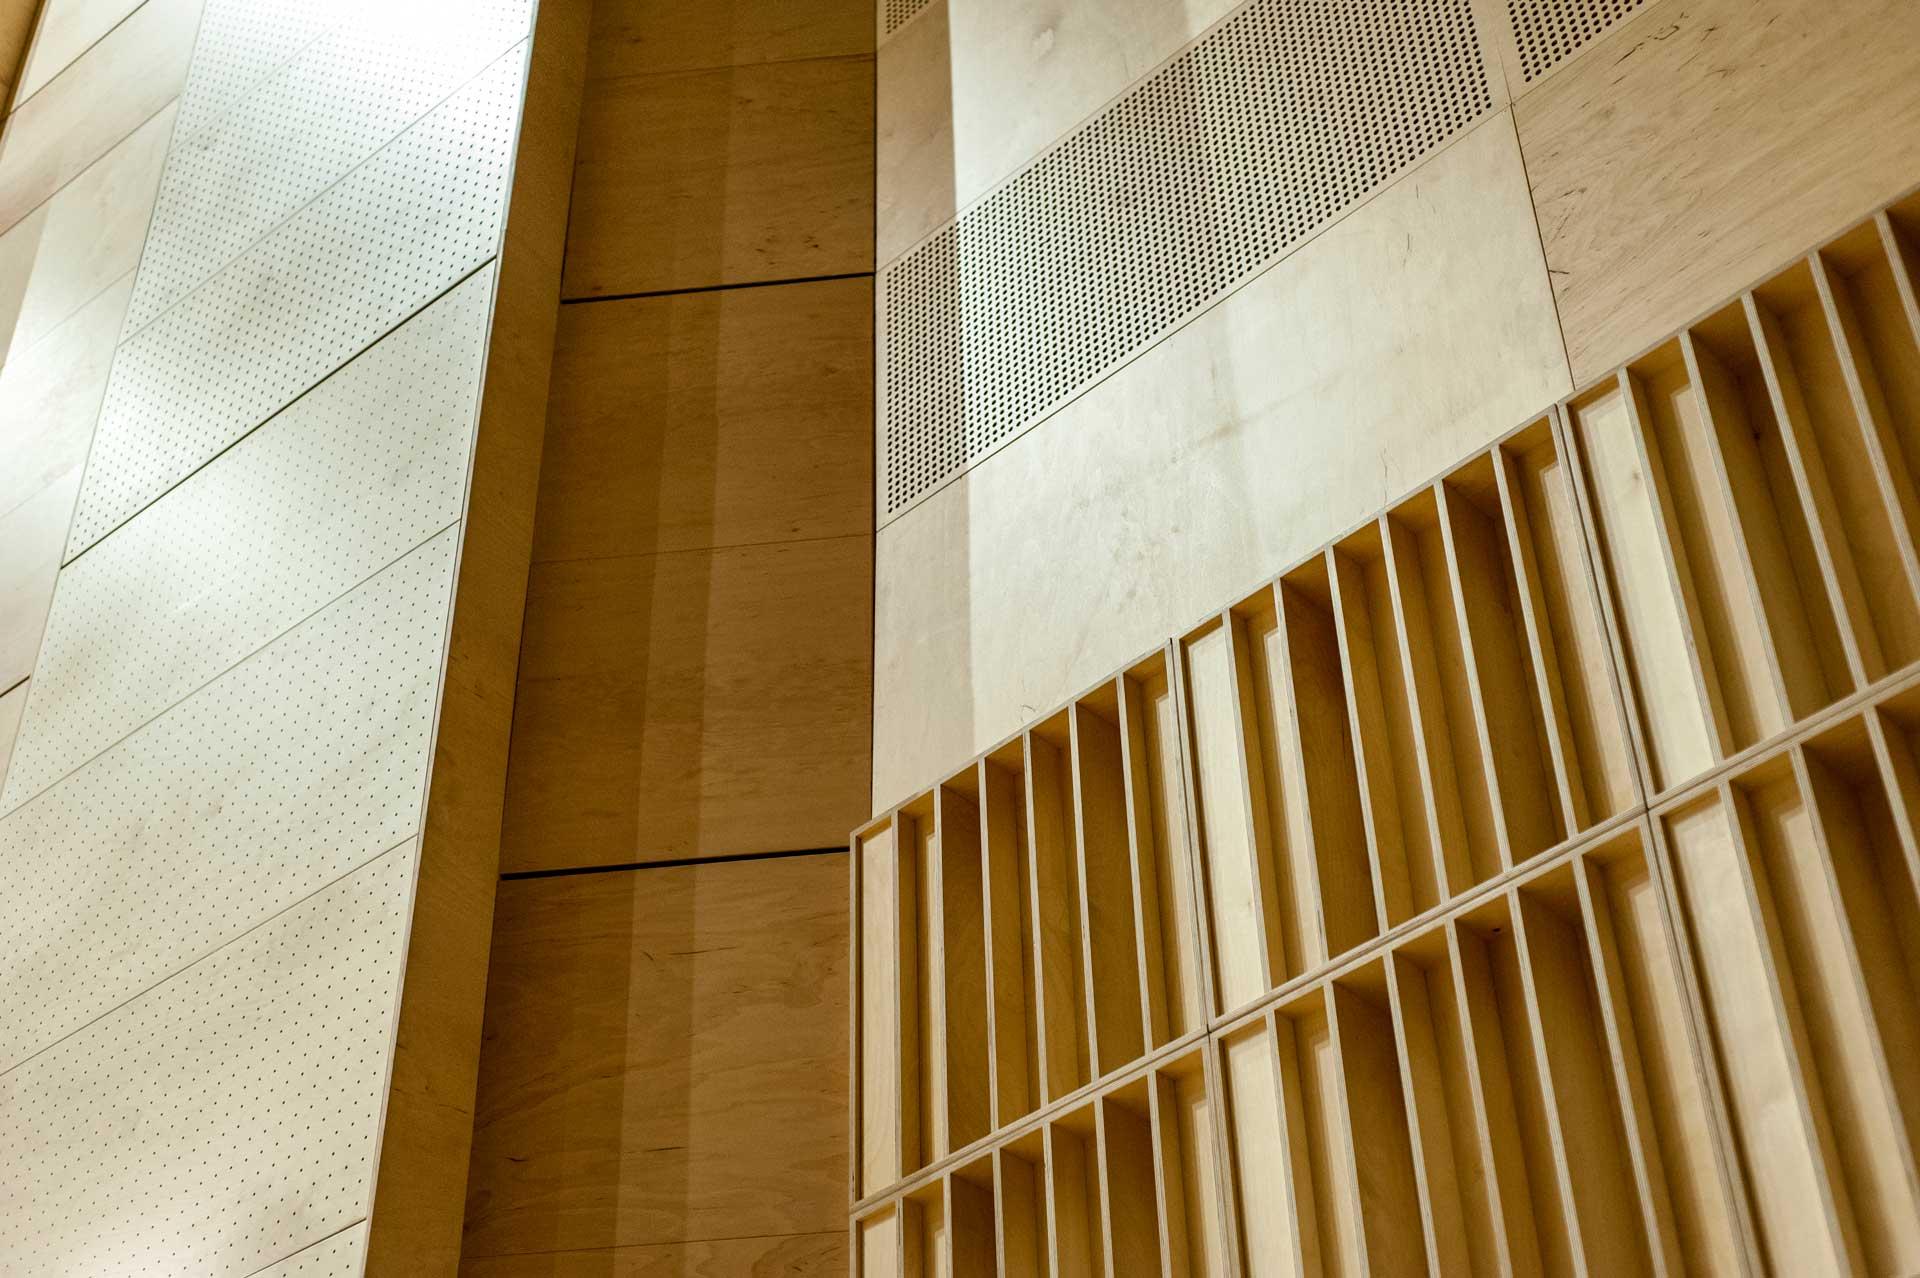 Panele perforowane, panele akustyczne, dyfuzory akustyczne